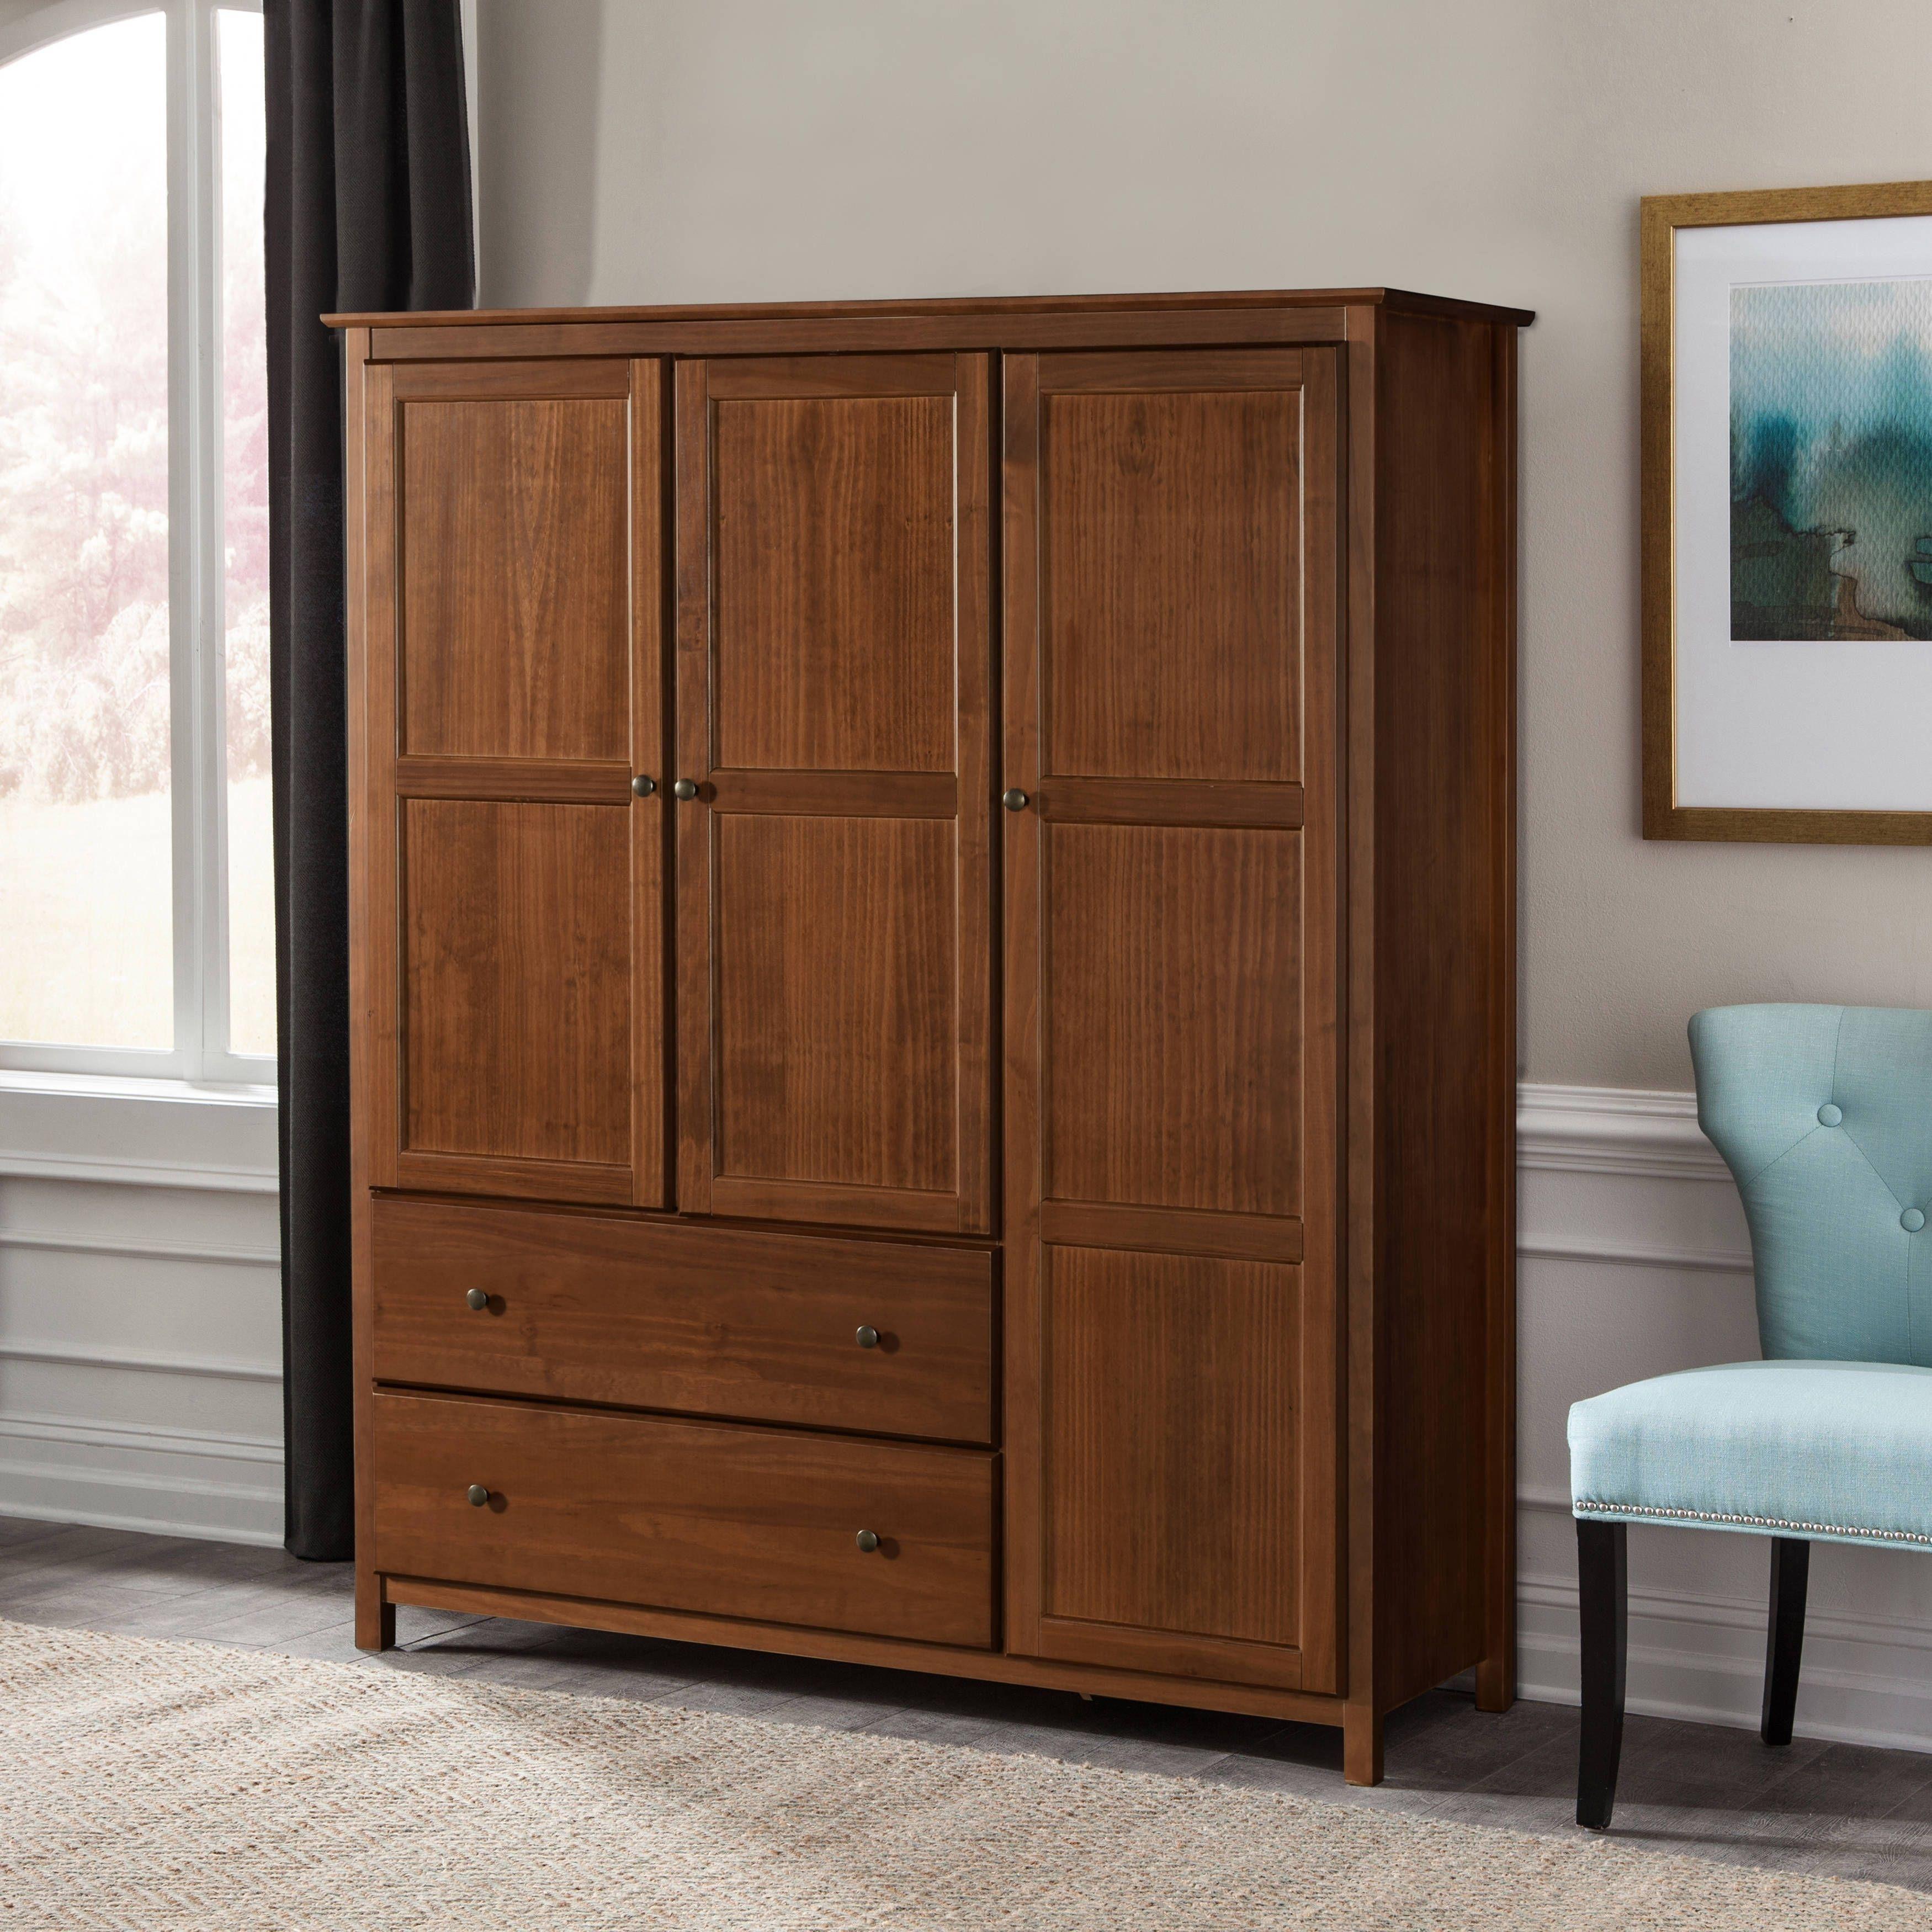 Grain Wood Furniture Shaker 3 Door Solid Armoire Walnut Finish